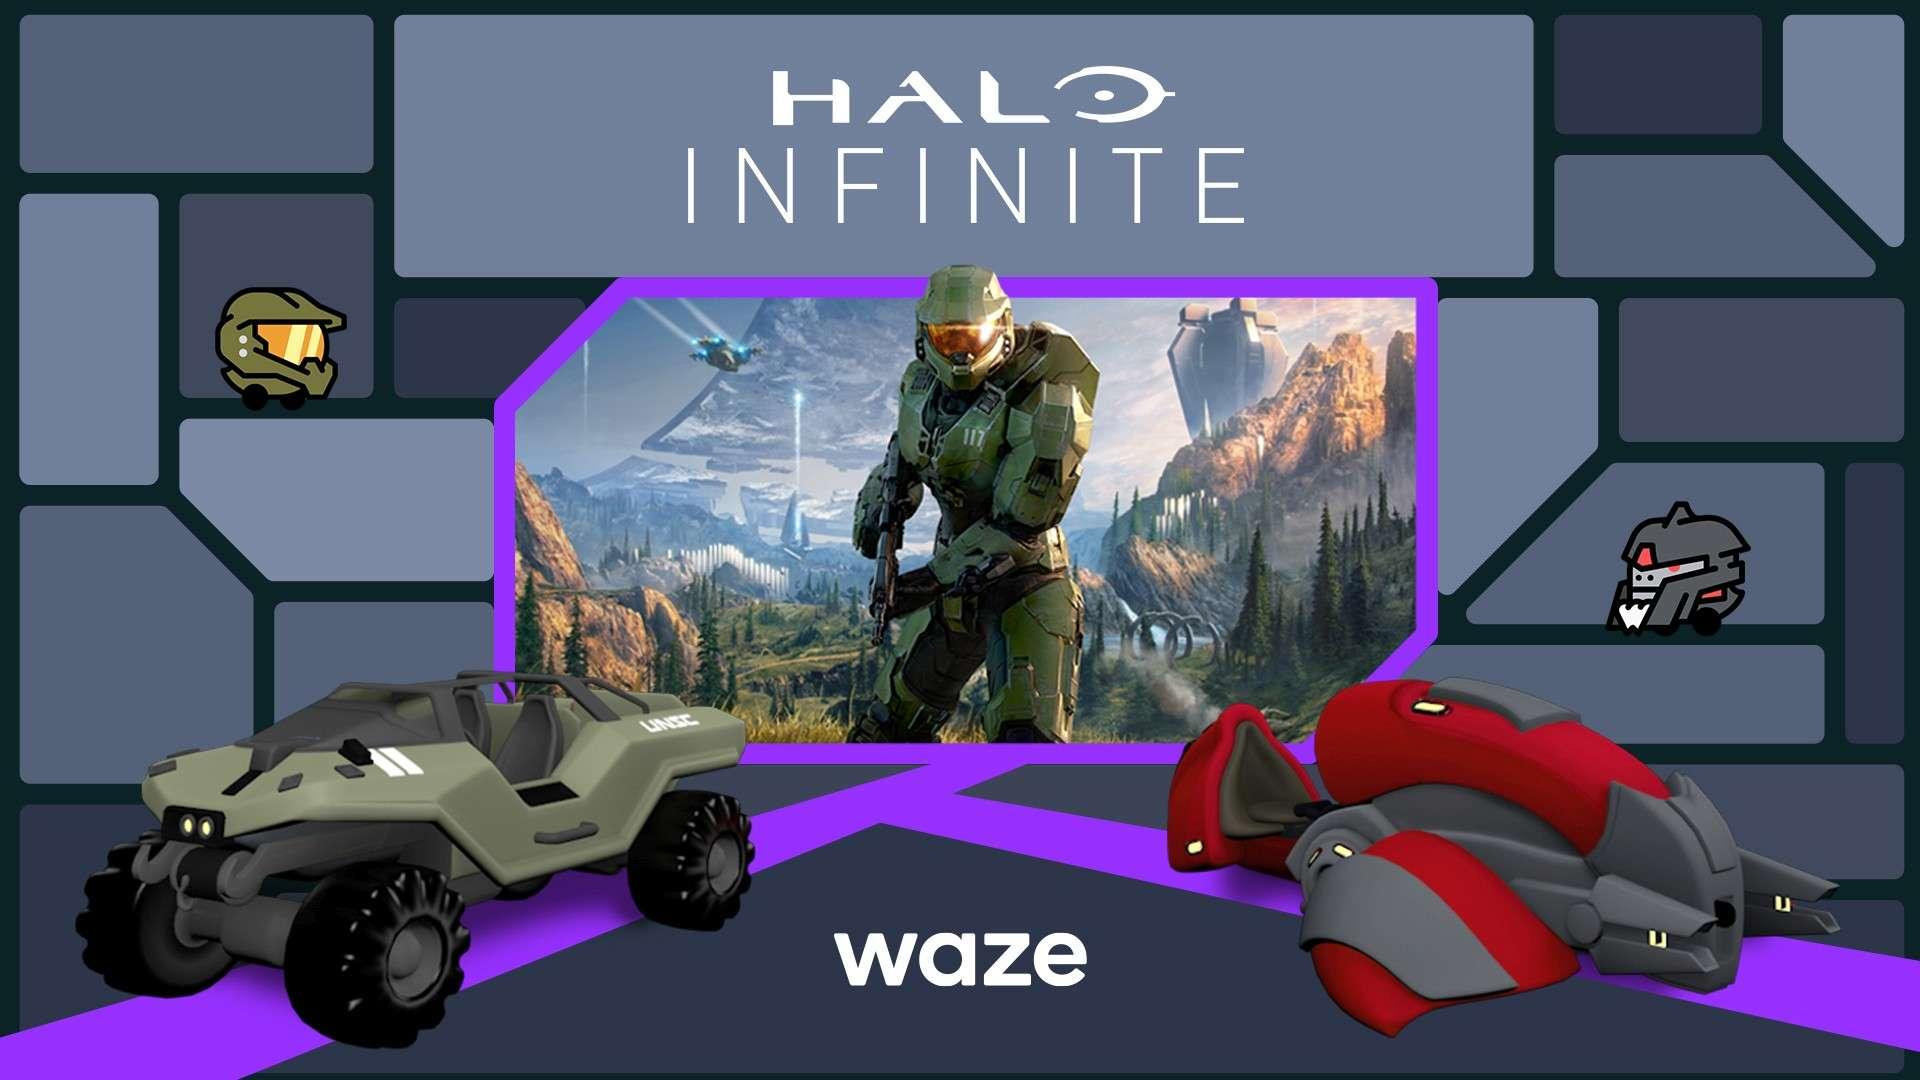 Halo Infinite Waze Partnership Hero